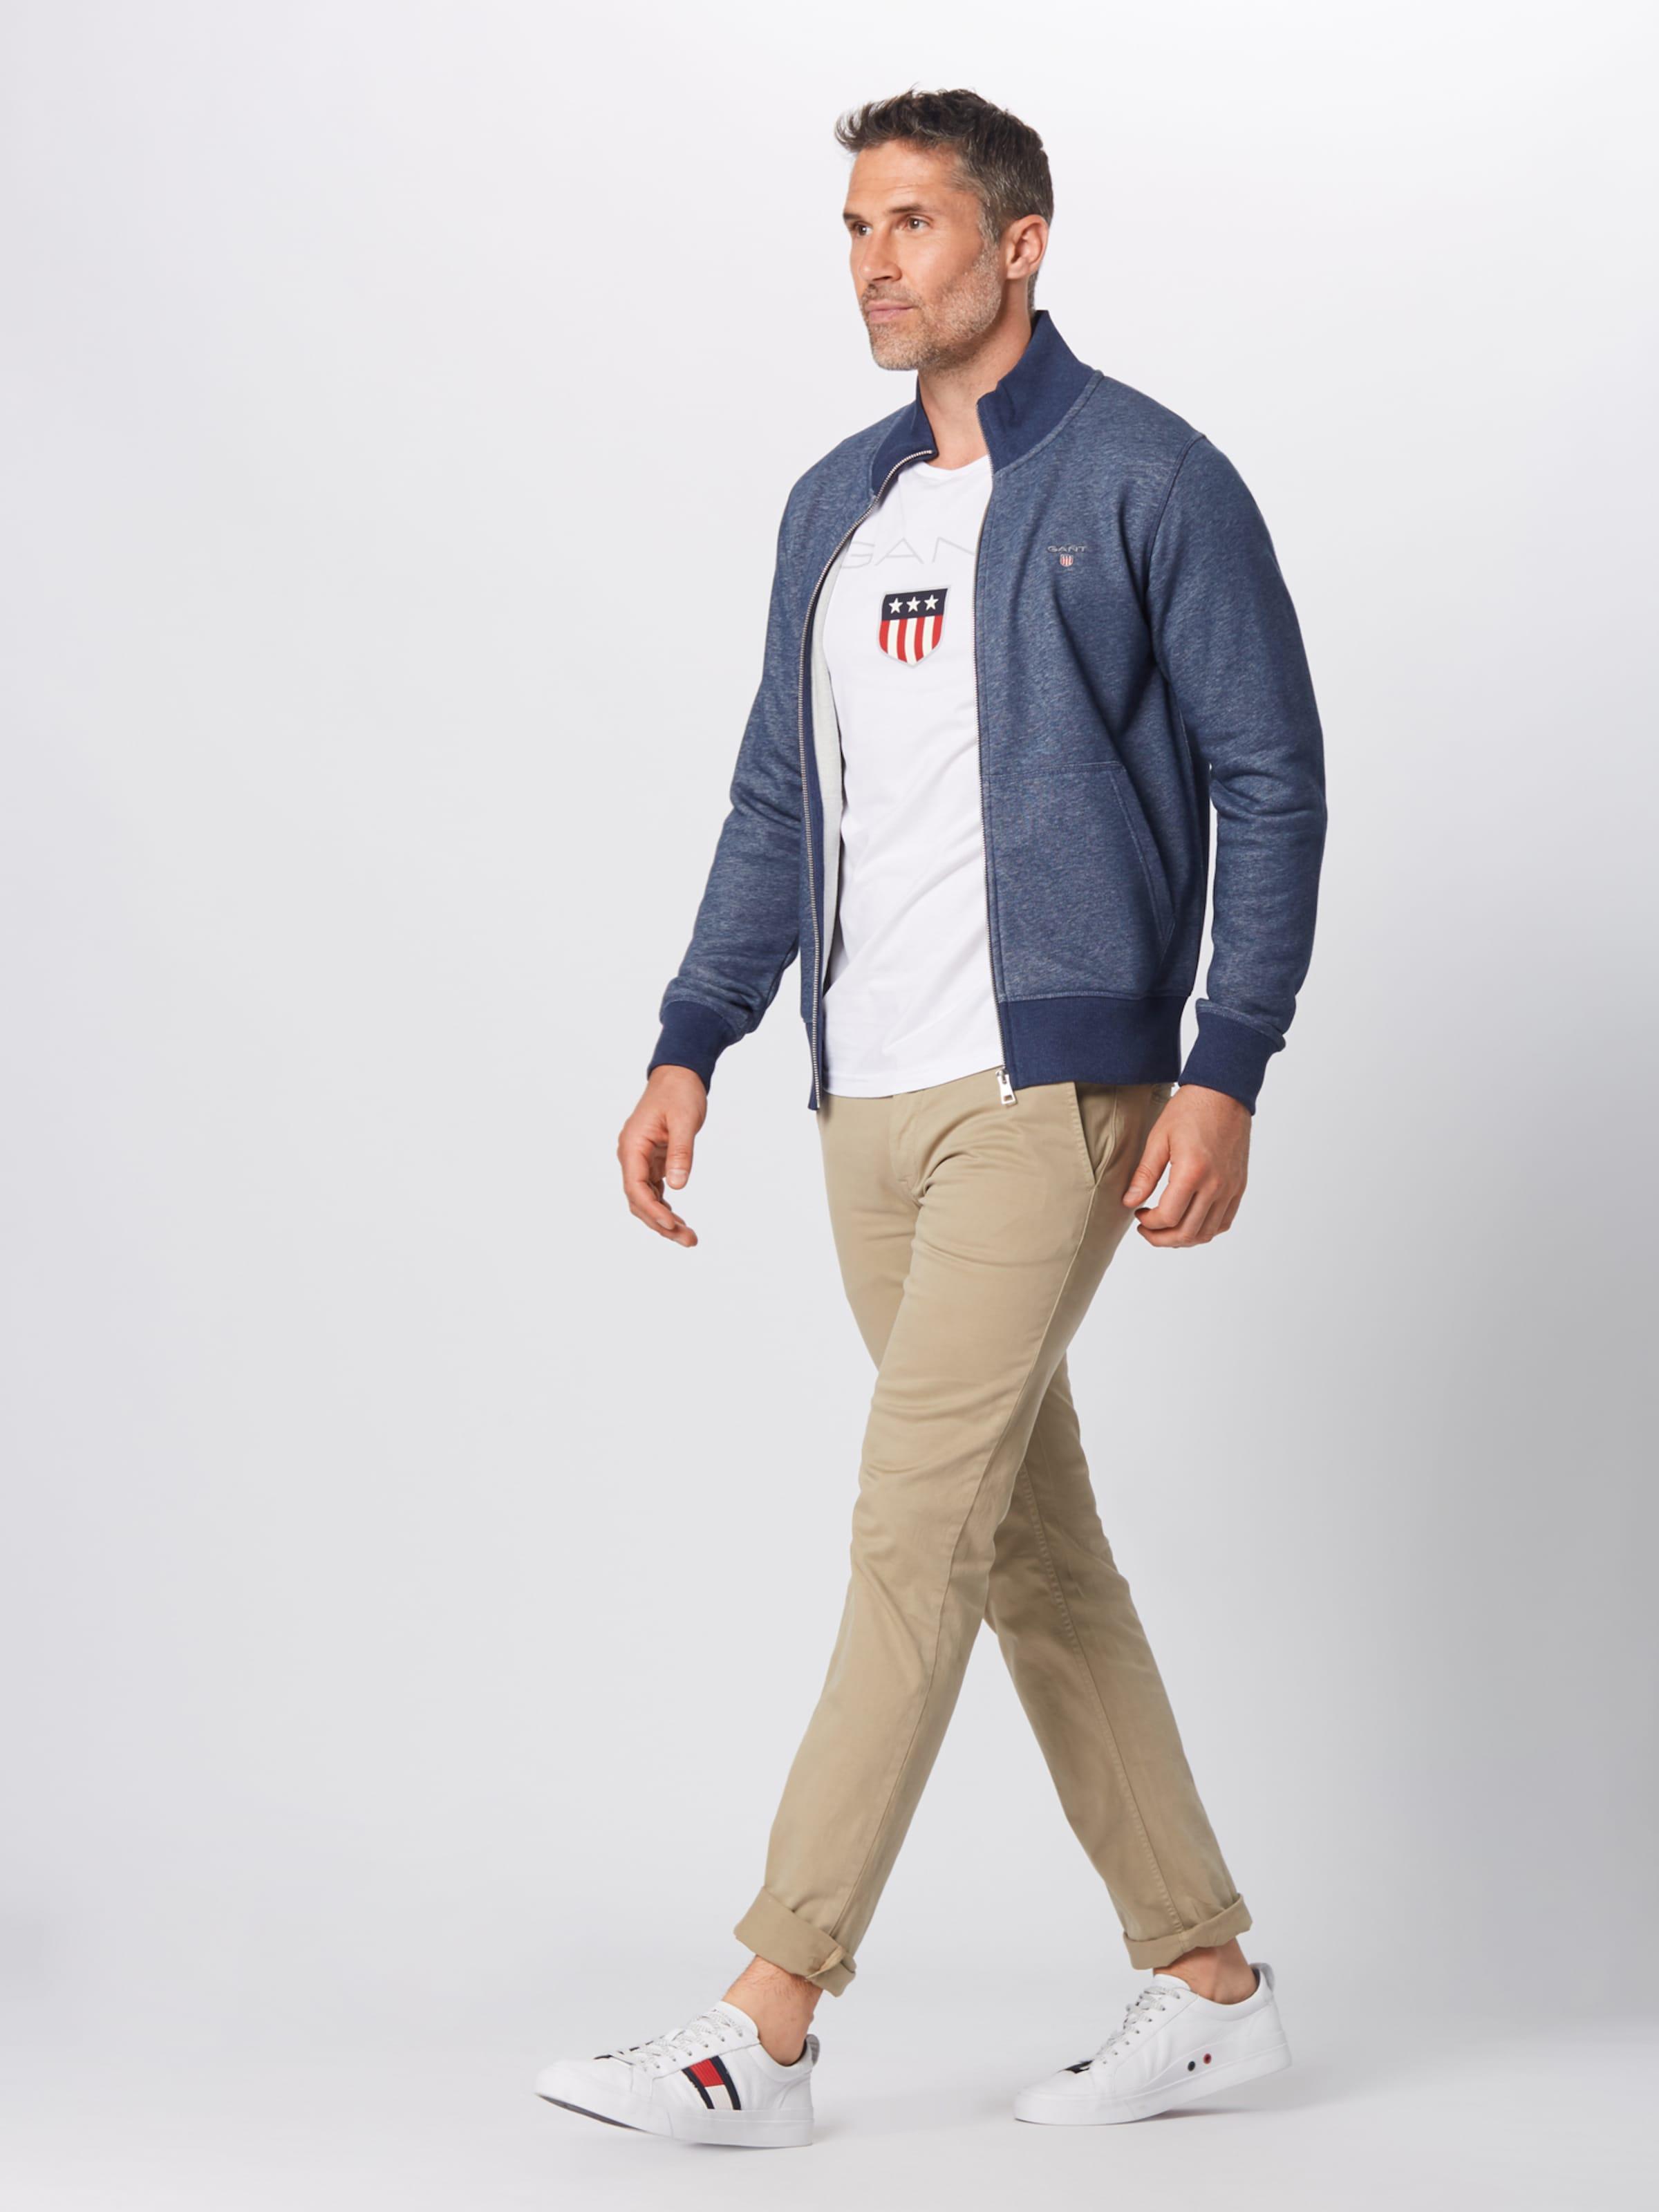 In Marine Zip Sweatjacke Original Full Gant Cardigan' 'the qLSzMGpjUV